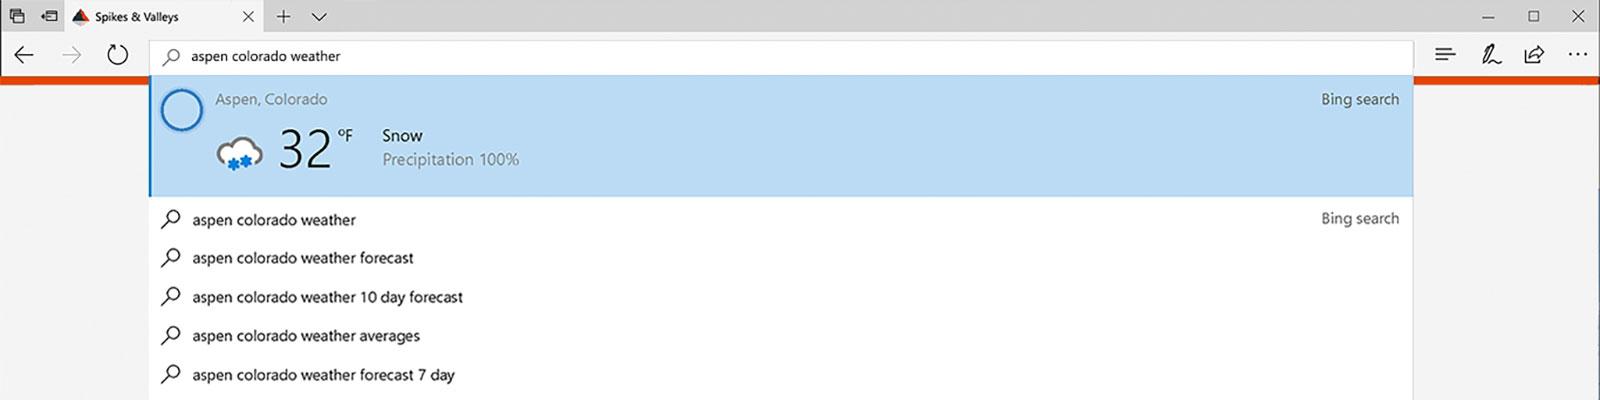 Microsoft Edge instant answers